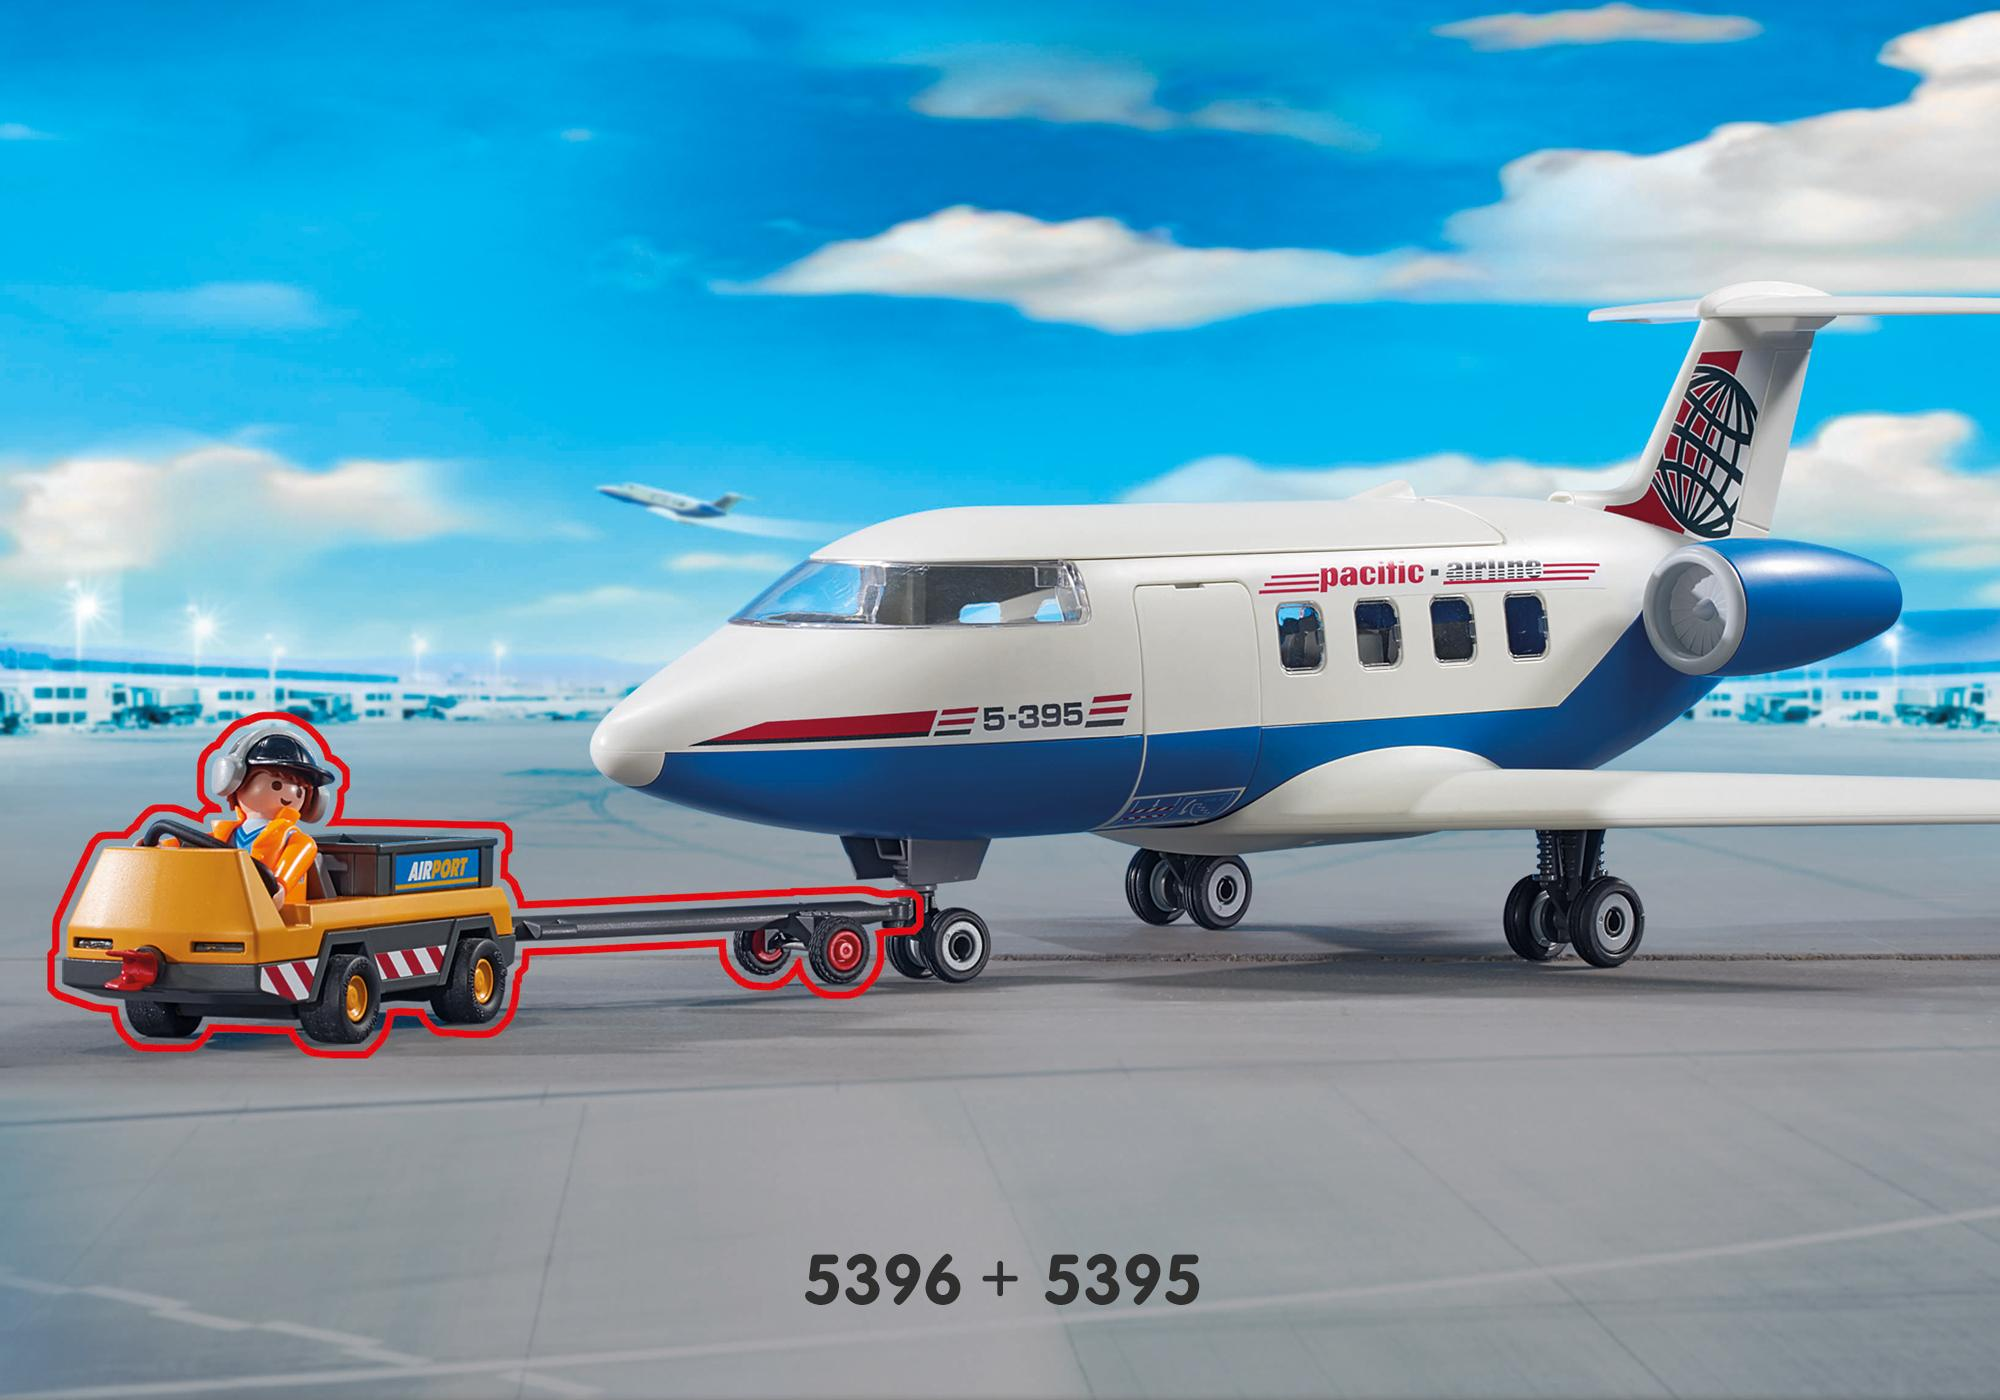 http://media.playmobil.com/i/playmobil/5396_product_extra2/Aircraft Tug with Ground Crew